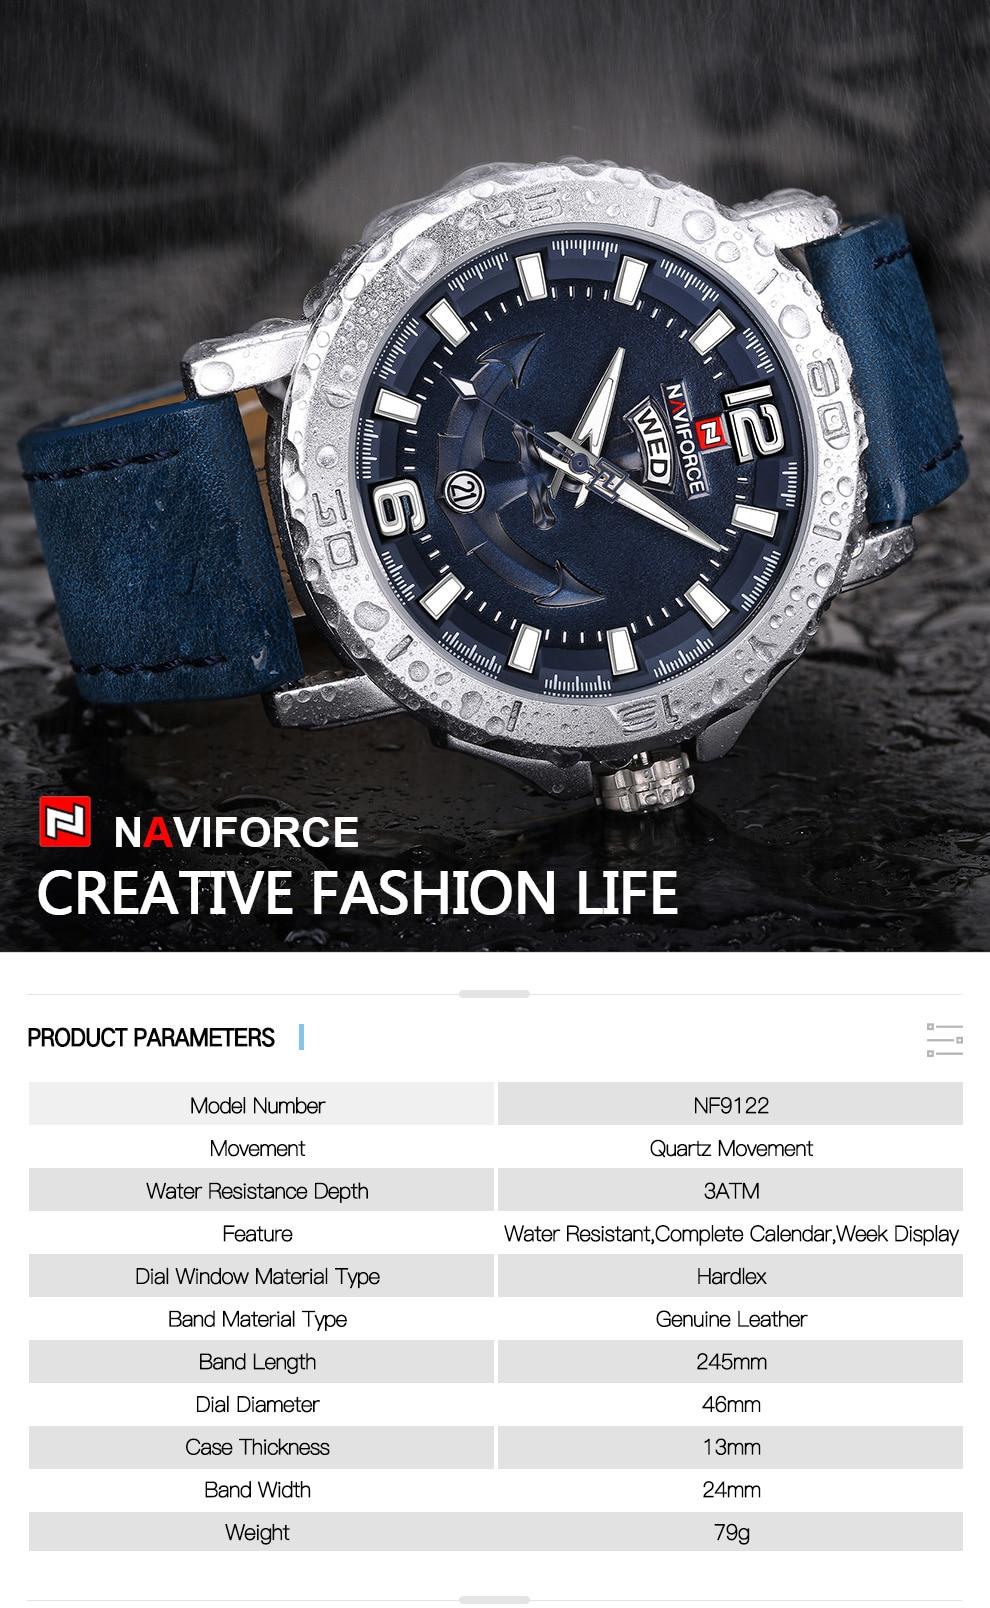 H75a808a212ab48908a8d7e8876e57d87b Top Luxury Brand NAVIFORCE Mens Sport Watches Casual Leather Strap Waterproof Military Quartz WristWatch Clock Male Reloj Hombre